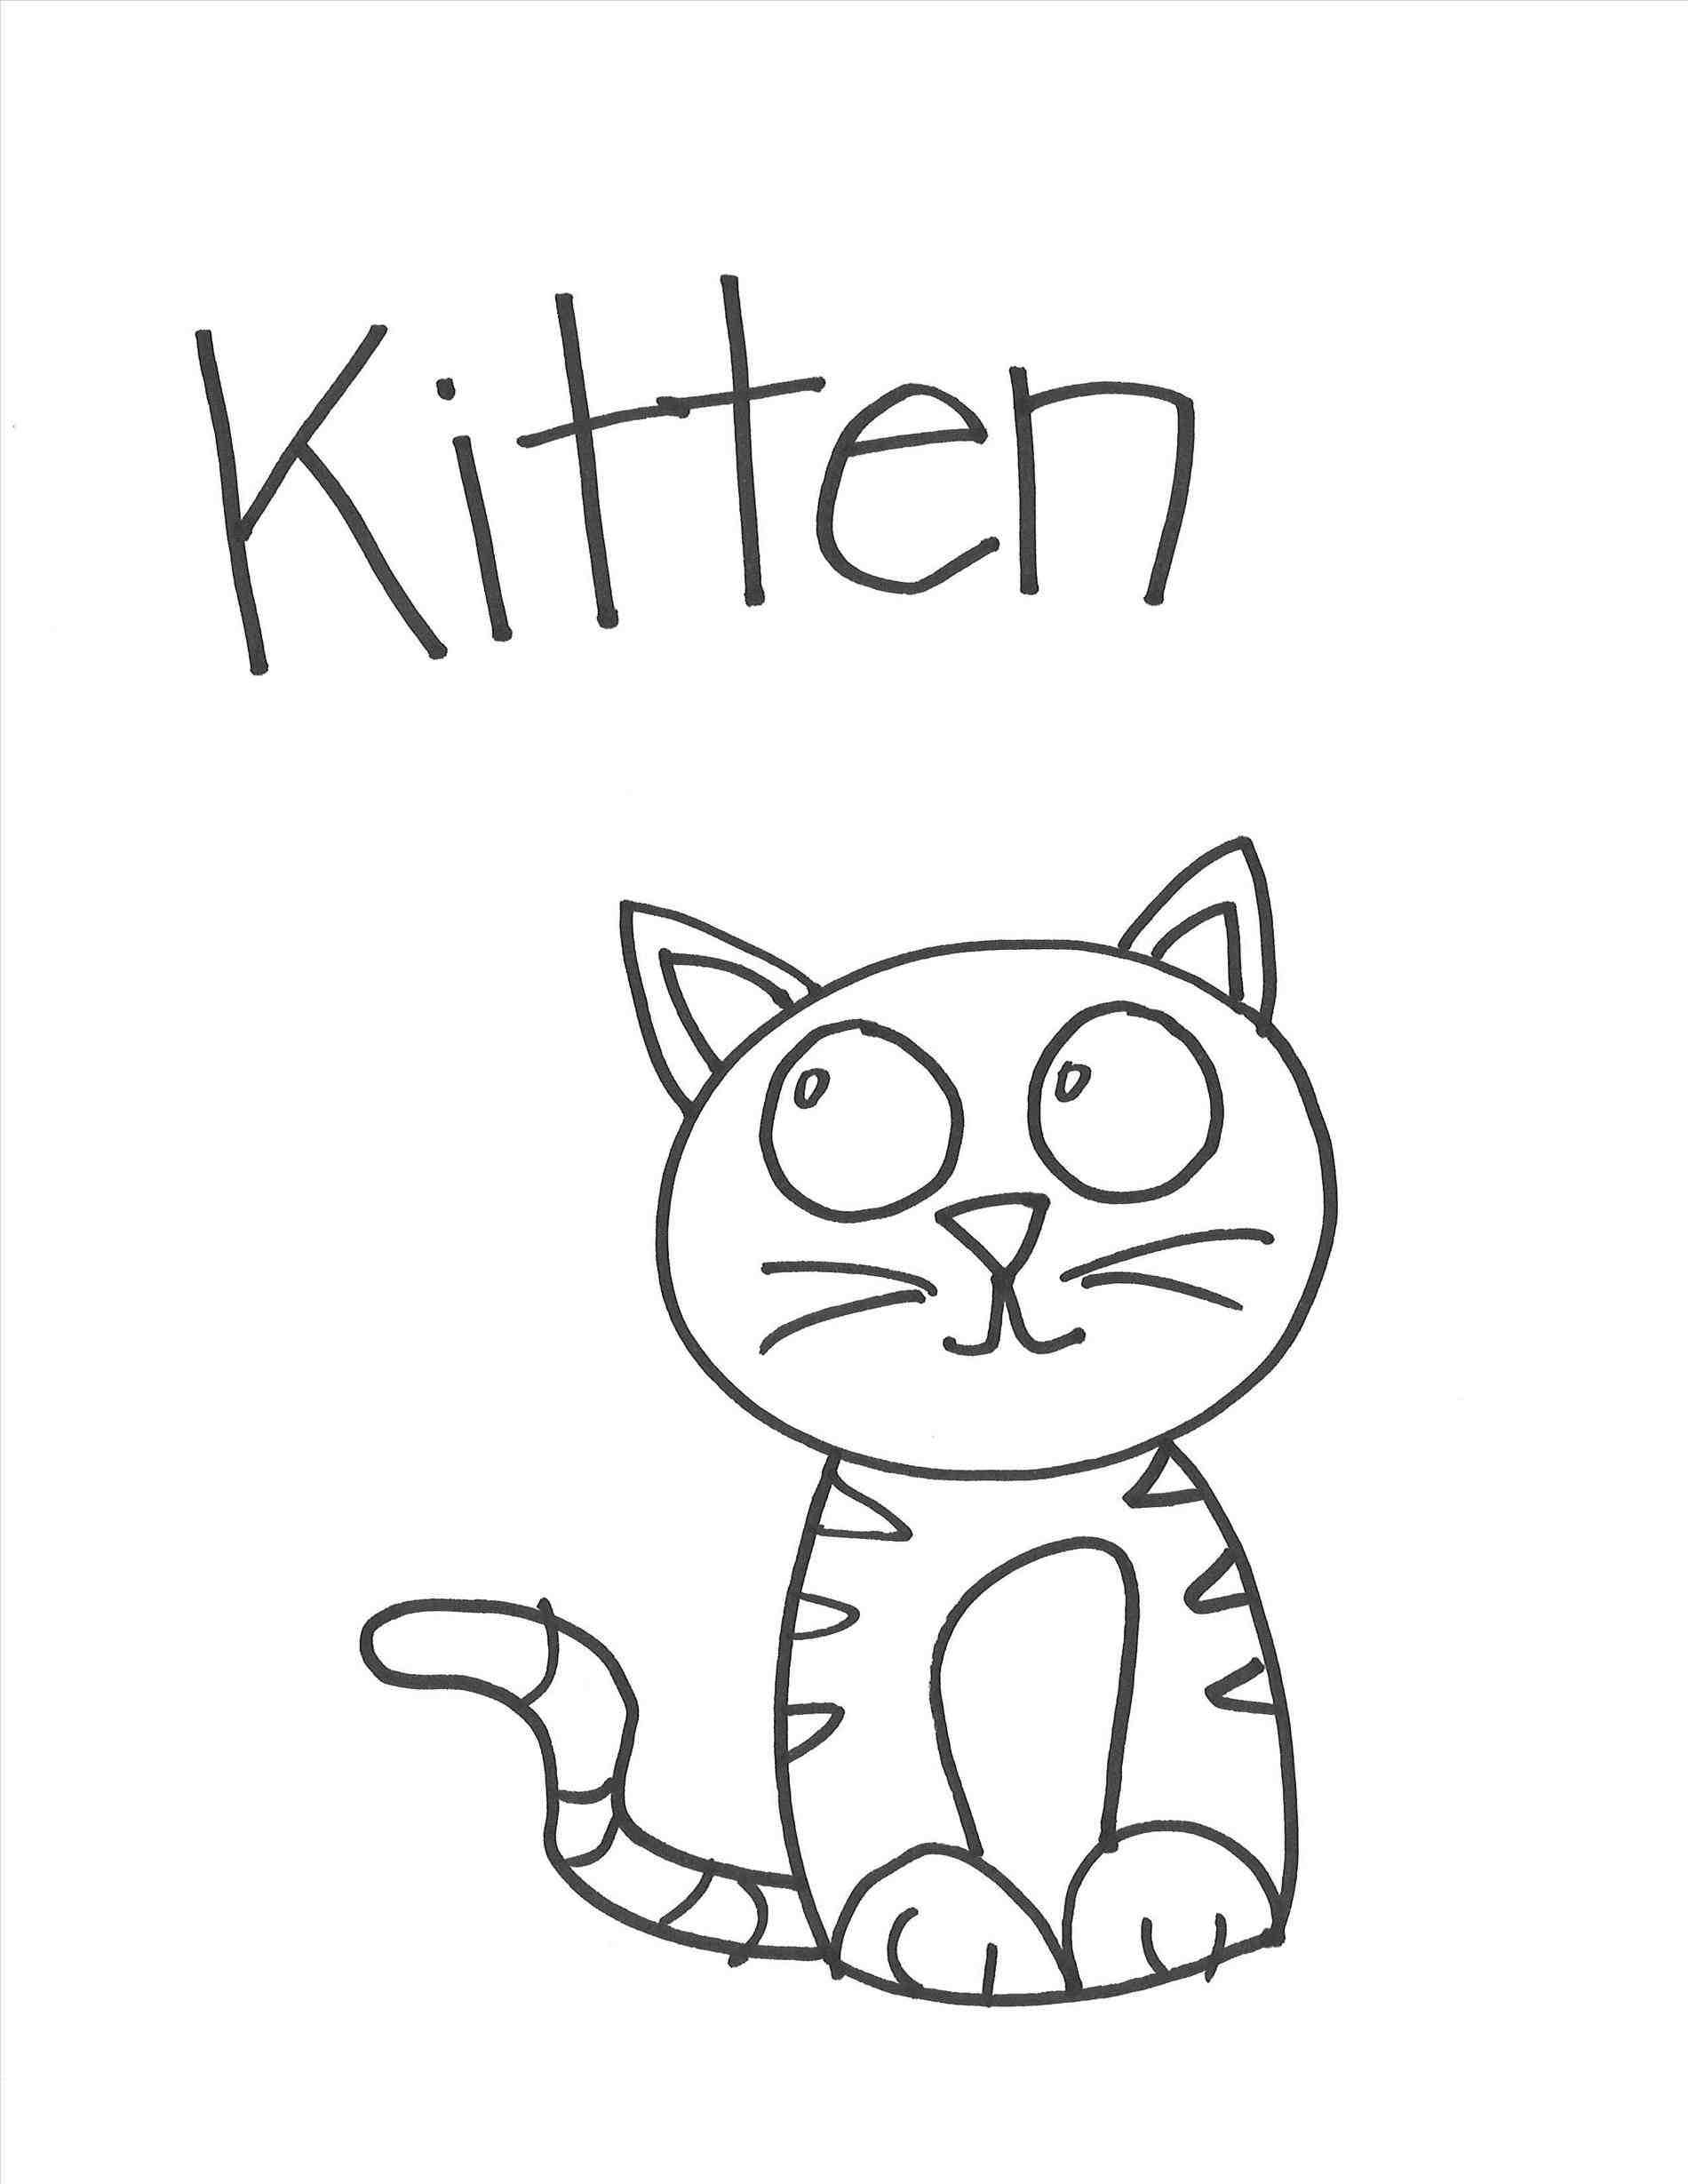 1900x2458 How To Draw A Kitten. How To Draw A Kitten Cute Easy Step By Step